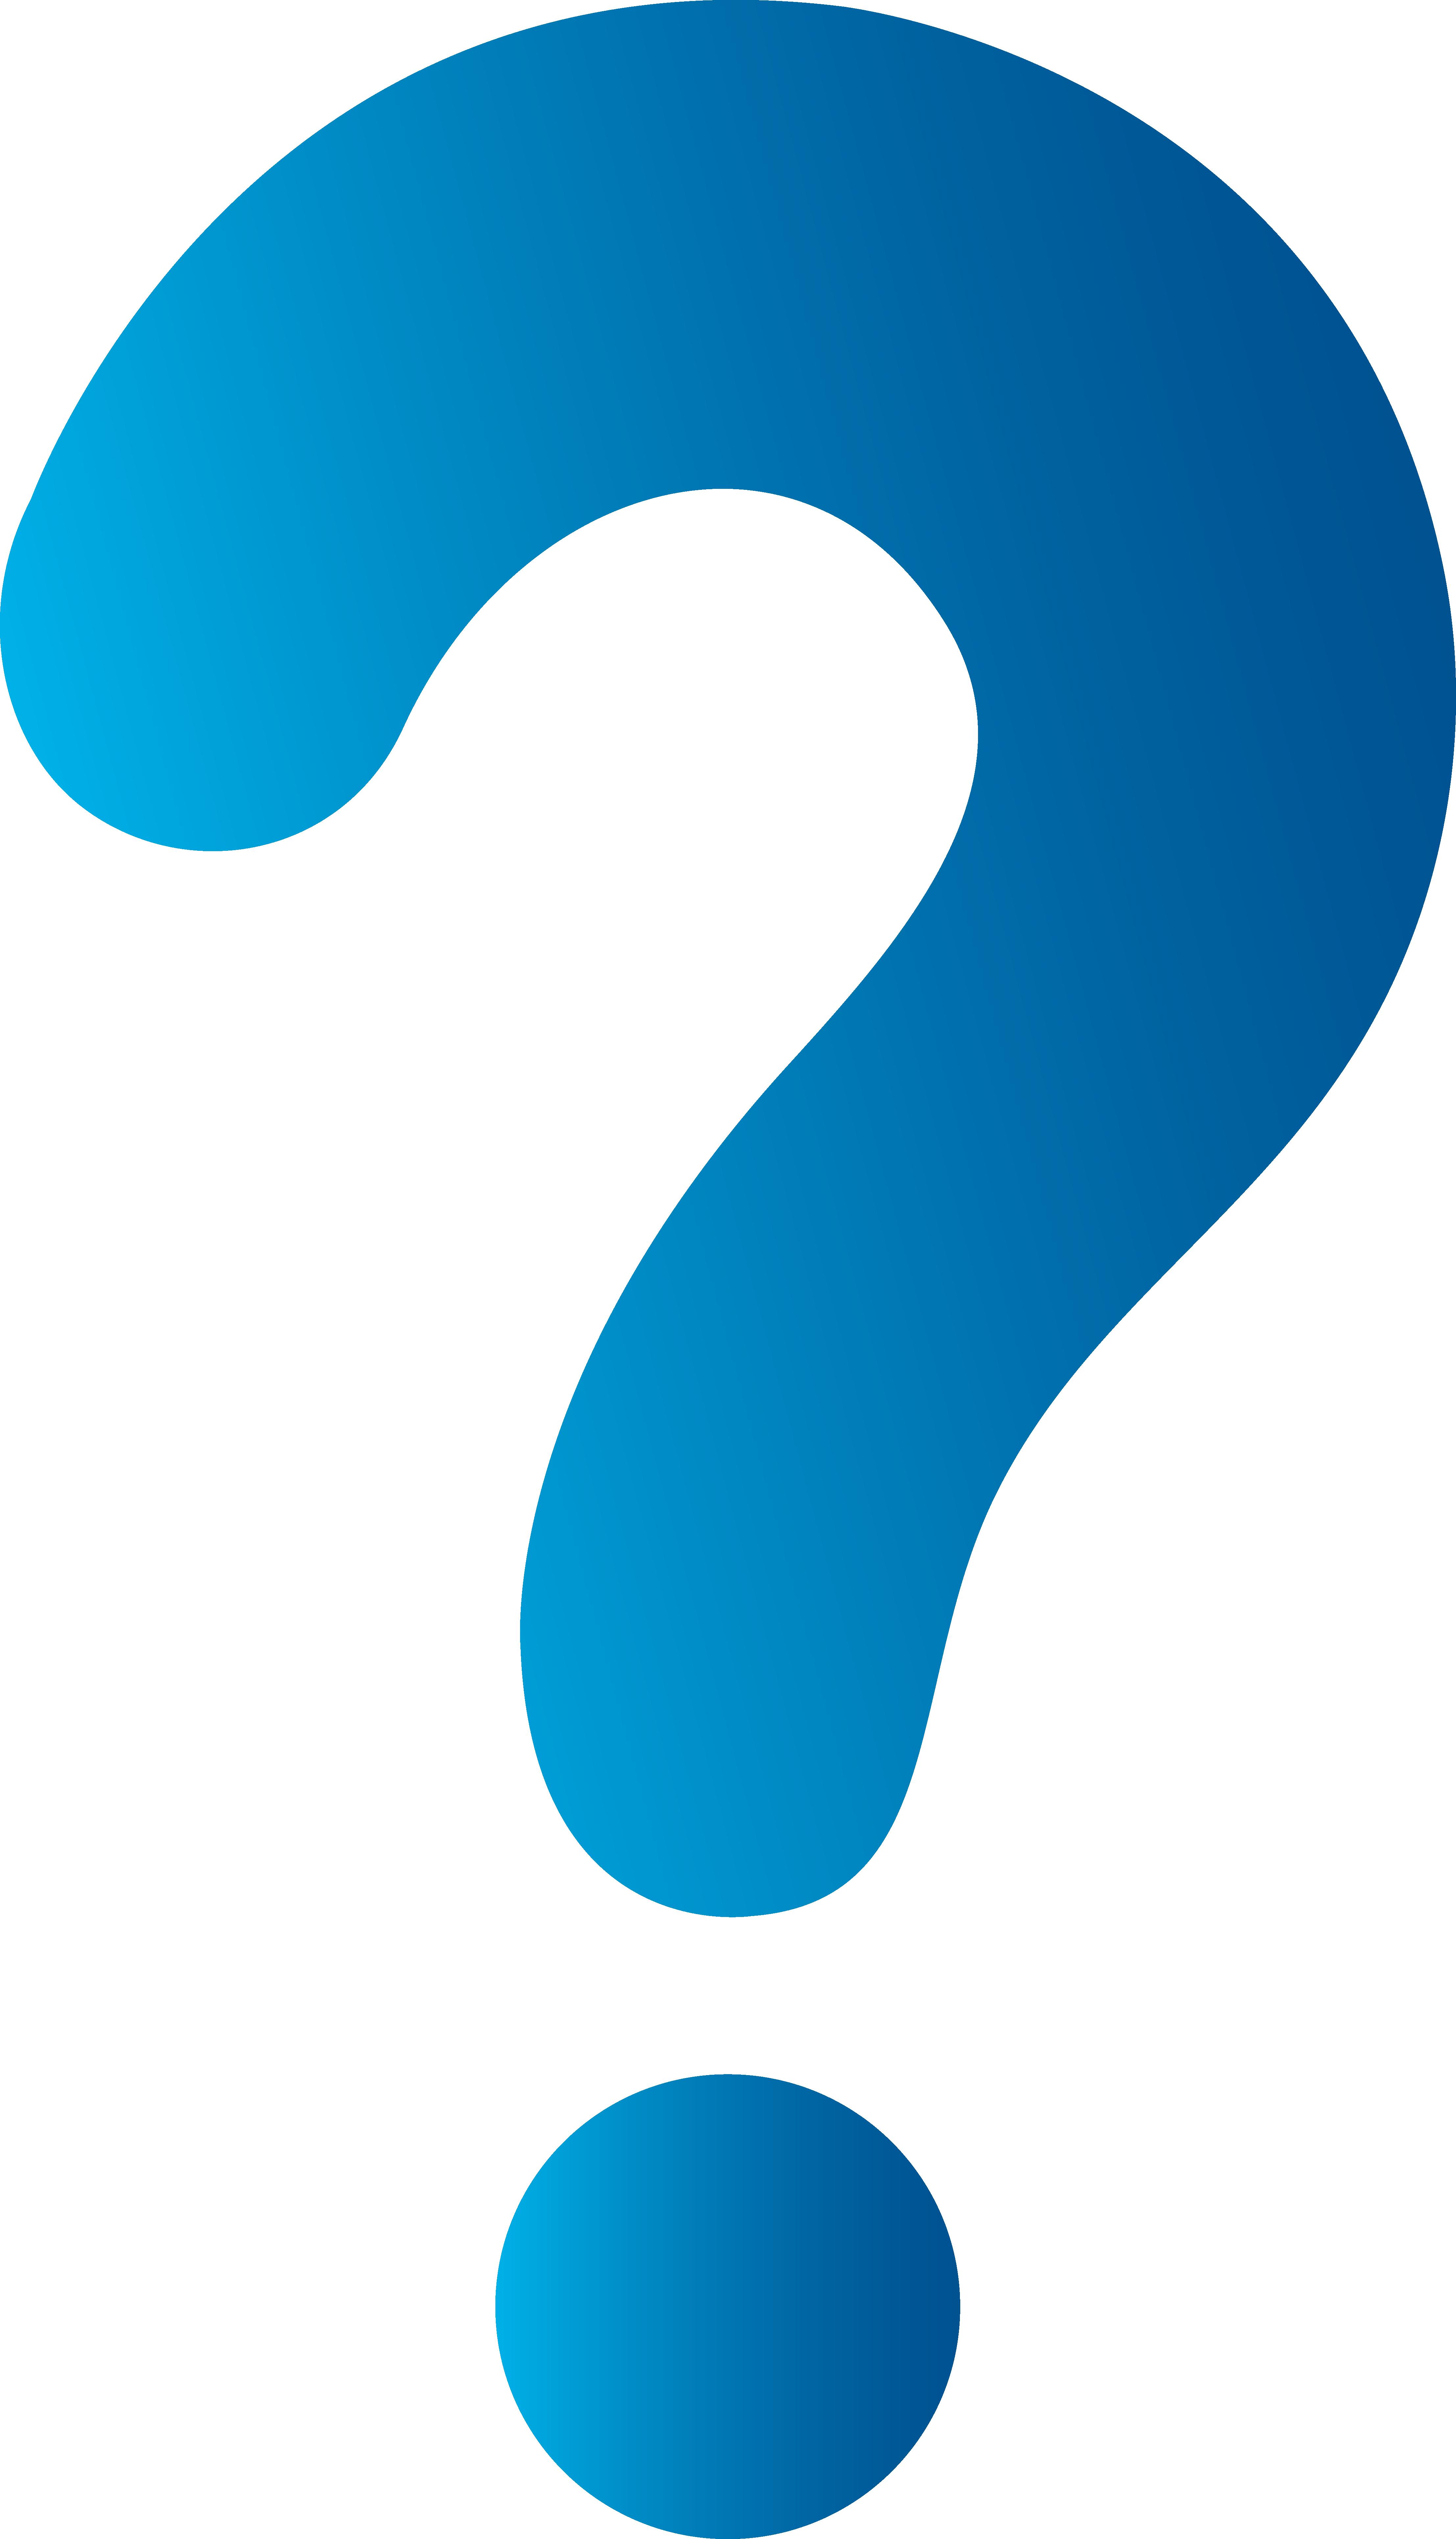 Questionmark desktop backgrounds simple. Interview clipart in depth